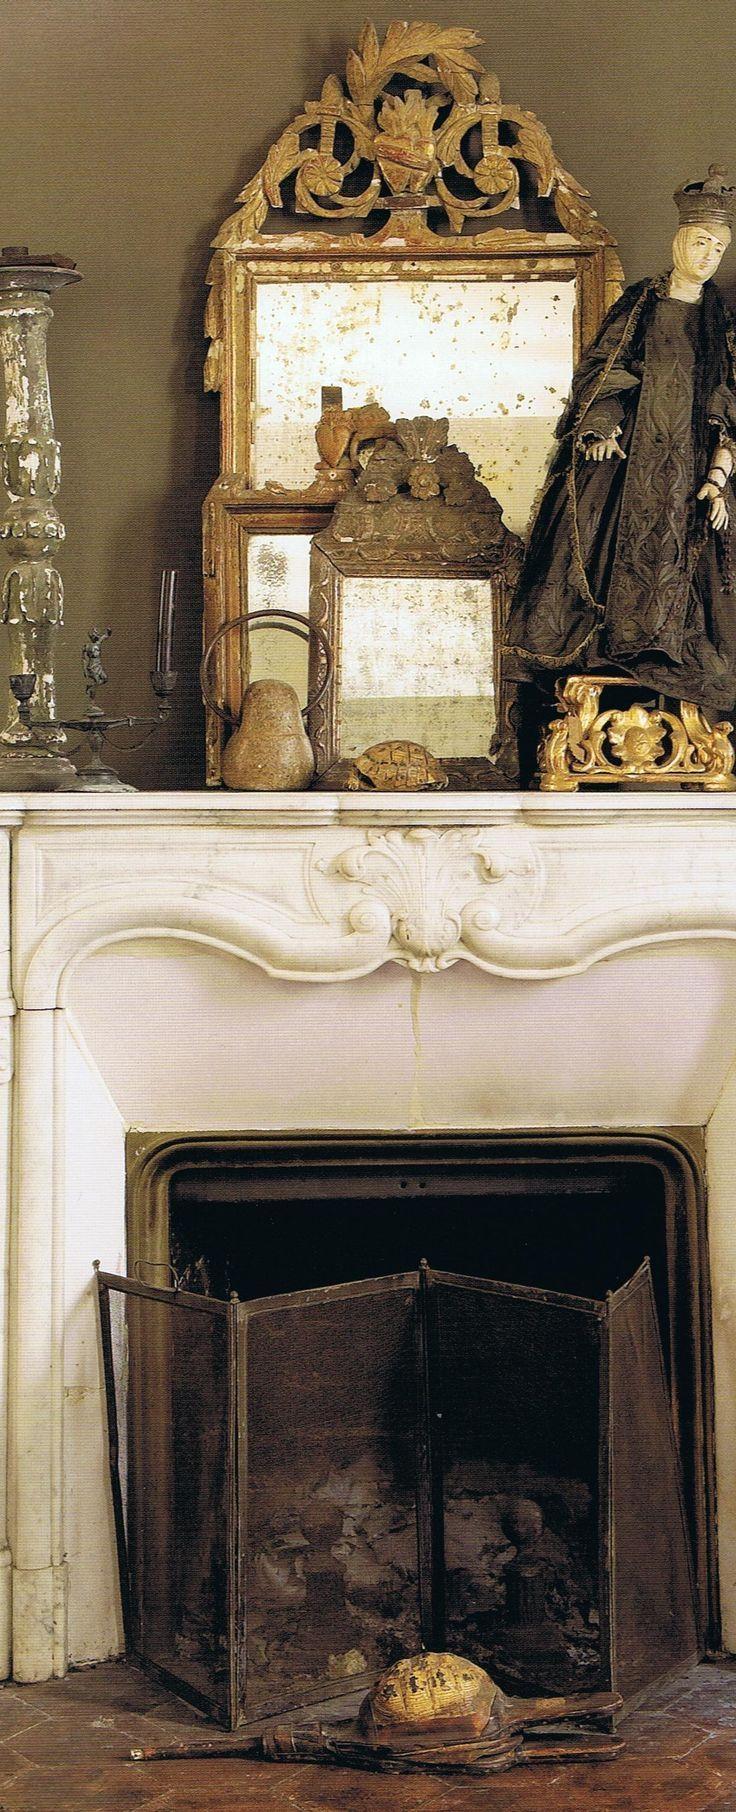 Best 25+ French Mirror Ideas On Pinterest | Antique Mirrors With French Mirrors Antique (Image 14 of 20)